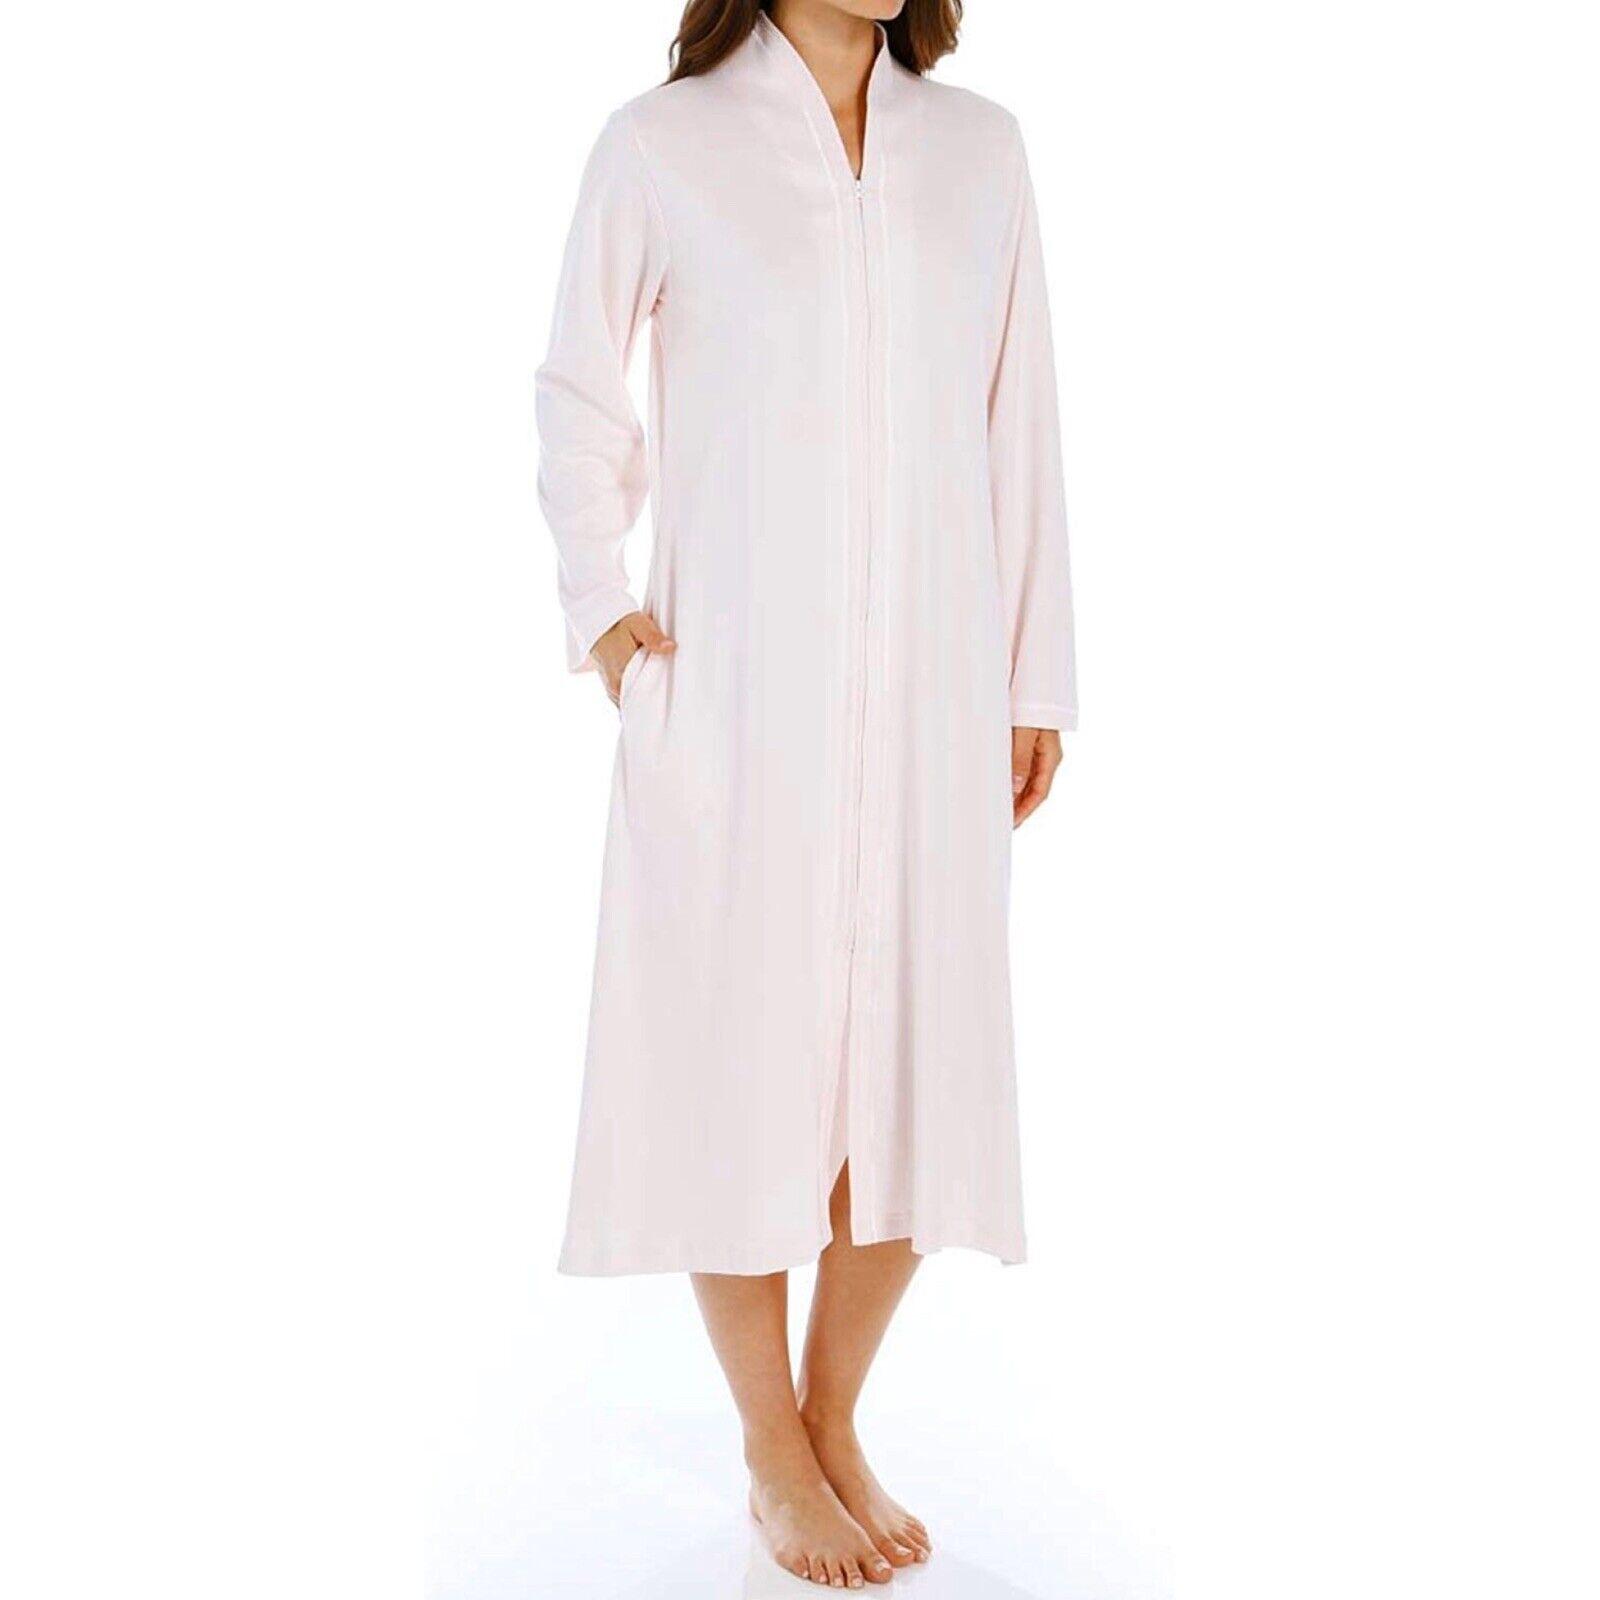 P-Jamas 355660 Butterknits Long Wrap Robe